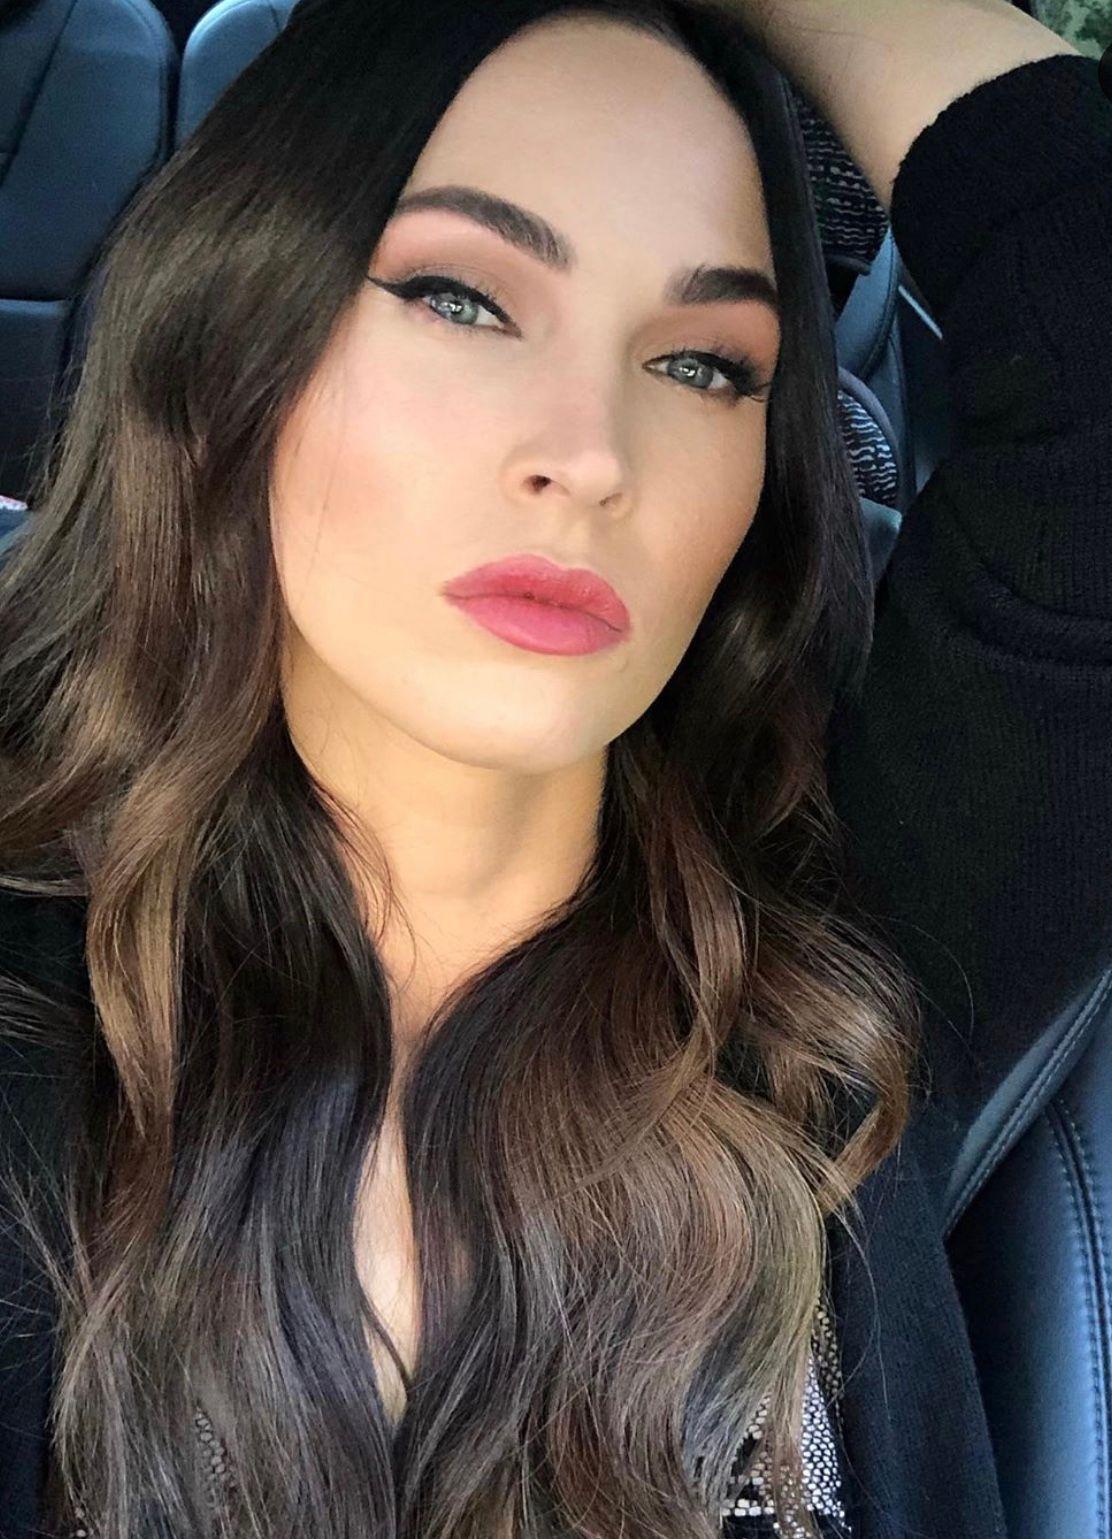 MachineGun Kelly Megan Fox poses for a selfie